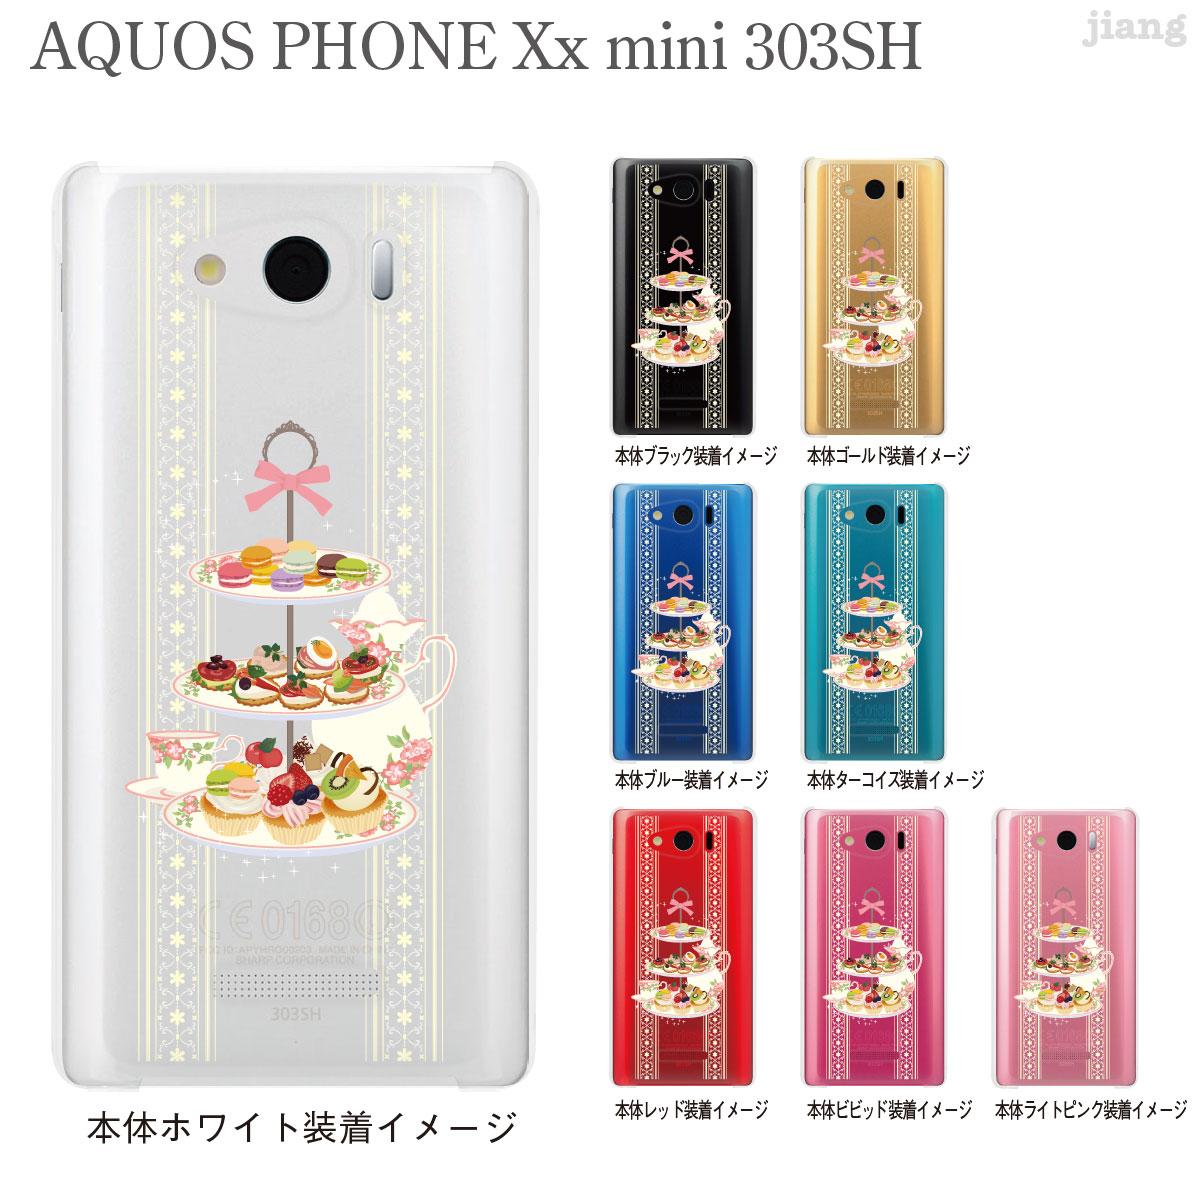 Tk Jiang Aquos Phone Xx Mini 303sh Soft Bank Case Cover Smartphone Sharp Clear Arts Afternoon Tea 09 Ca0037